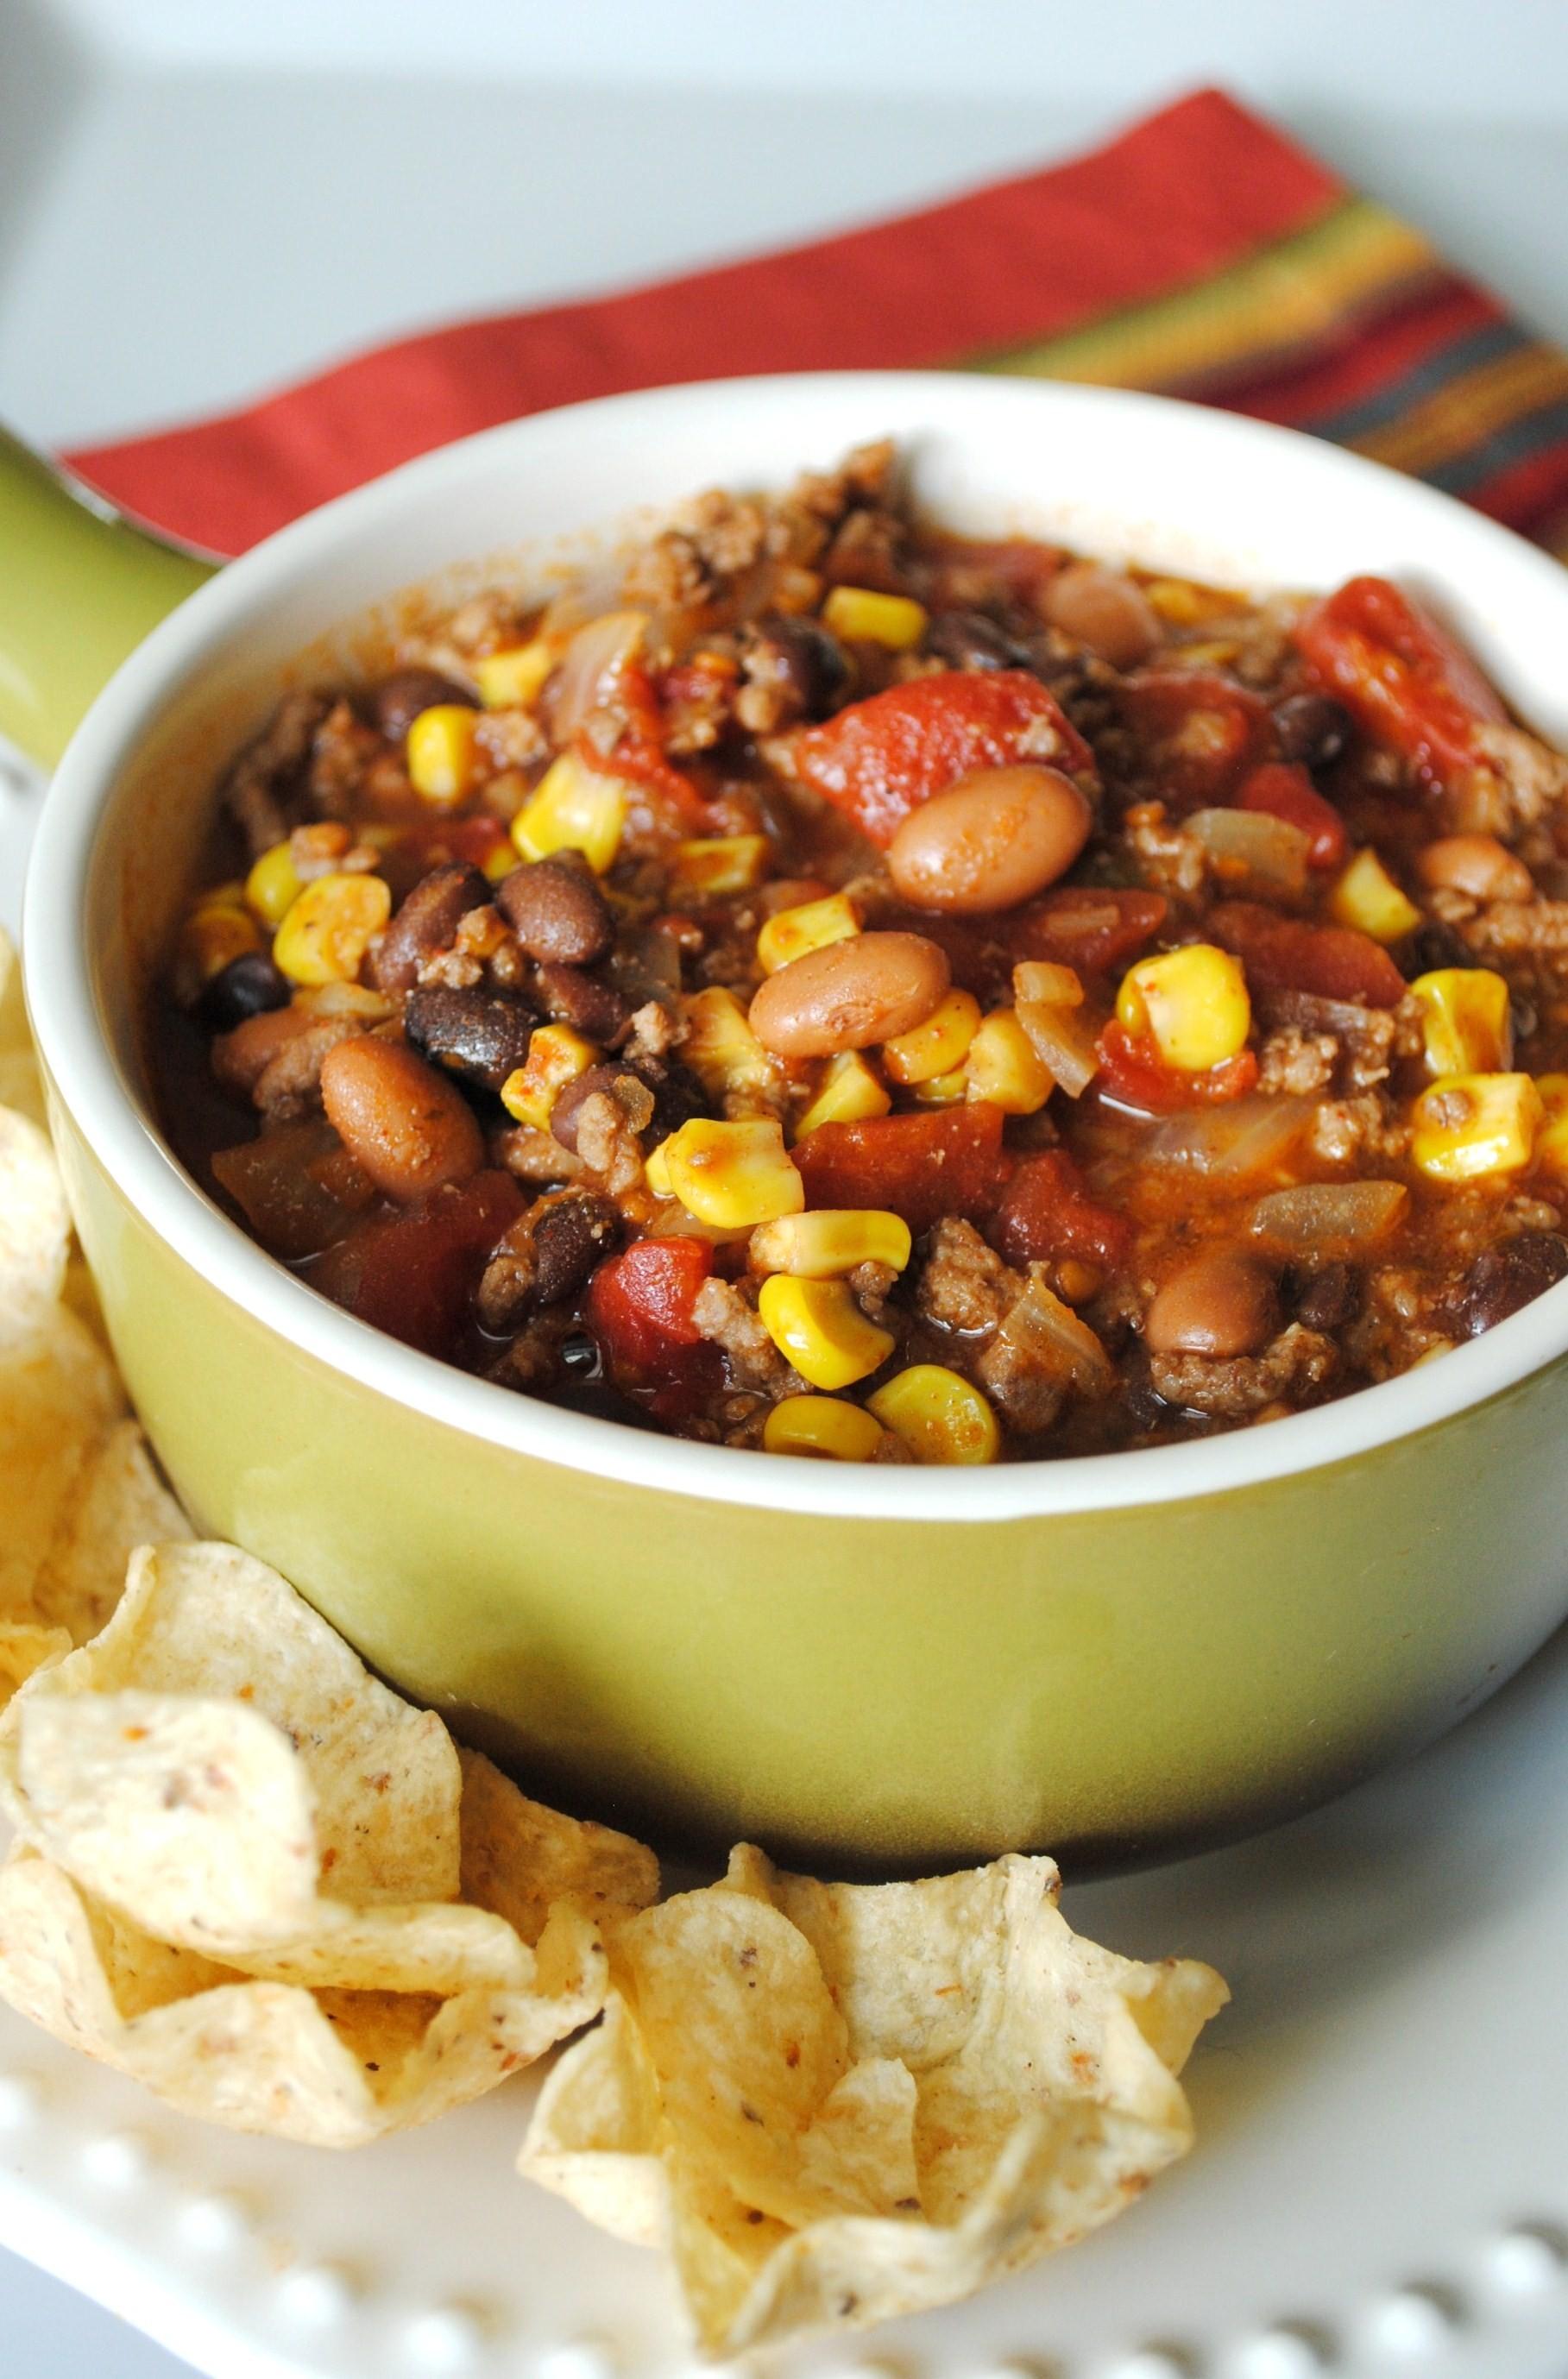 How To Make Taco Soup VI : Glorious Soup Recipes